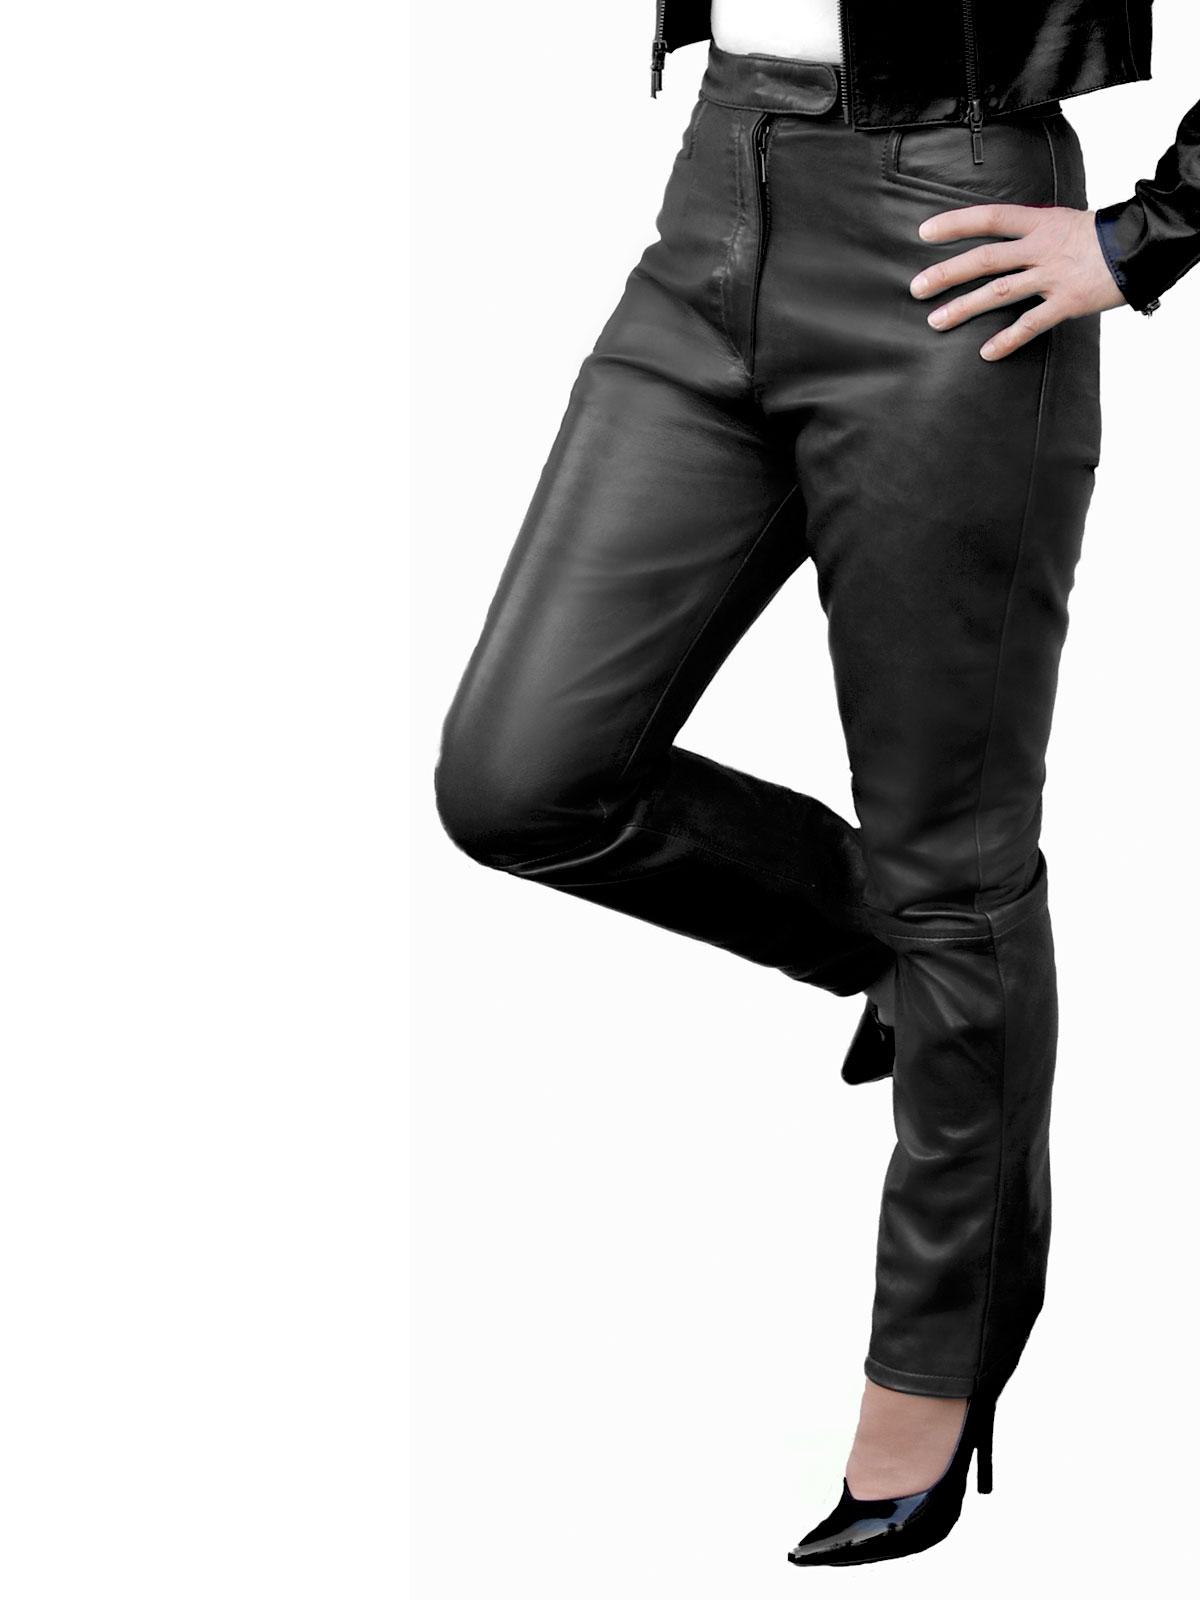 Black Leather Fashion Gloves